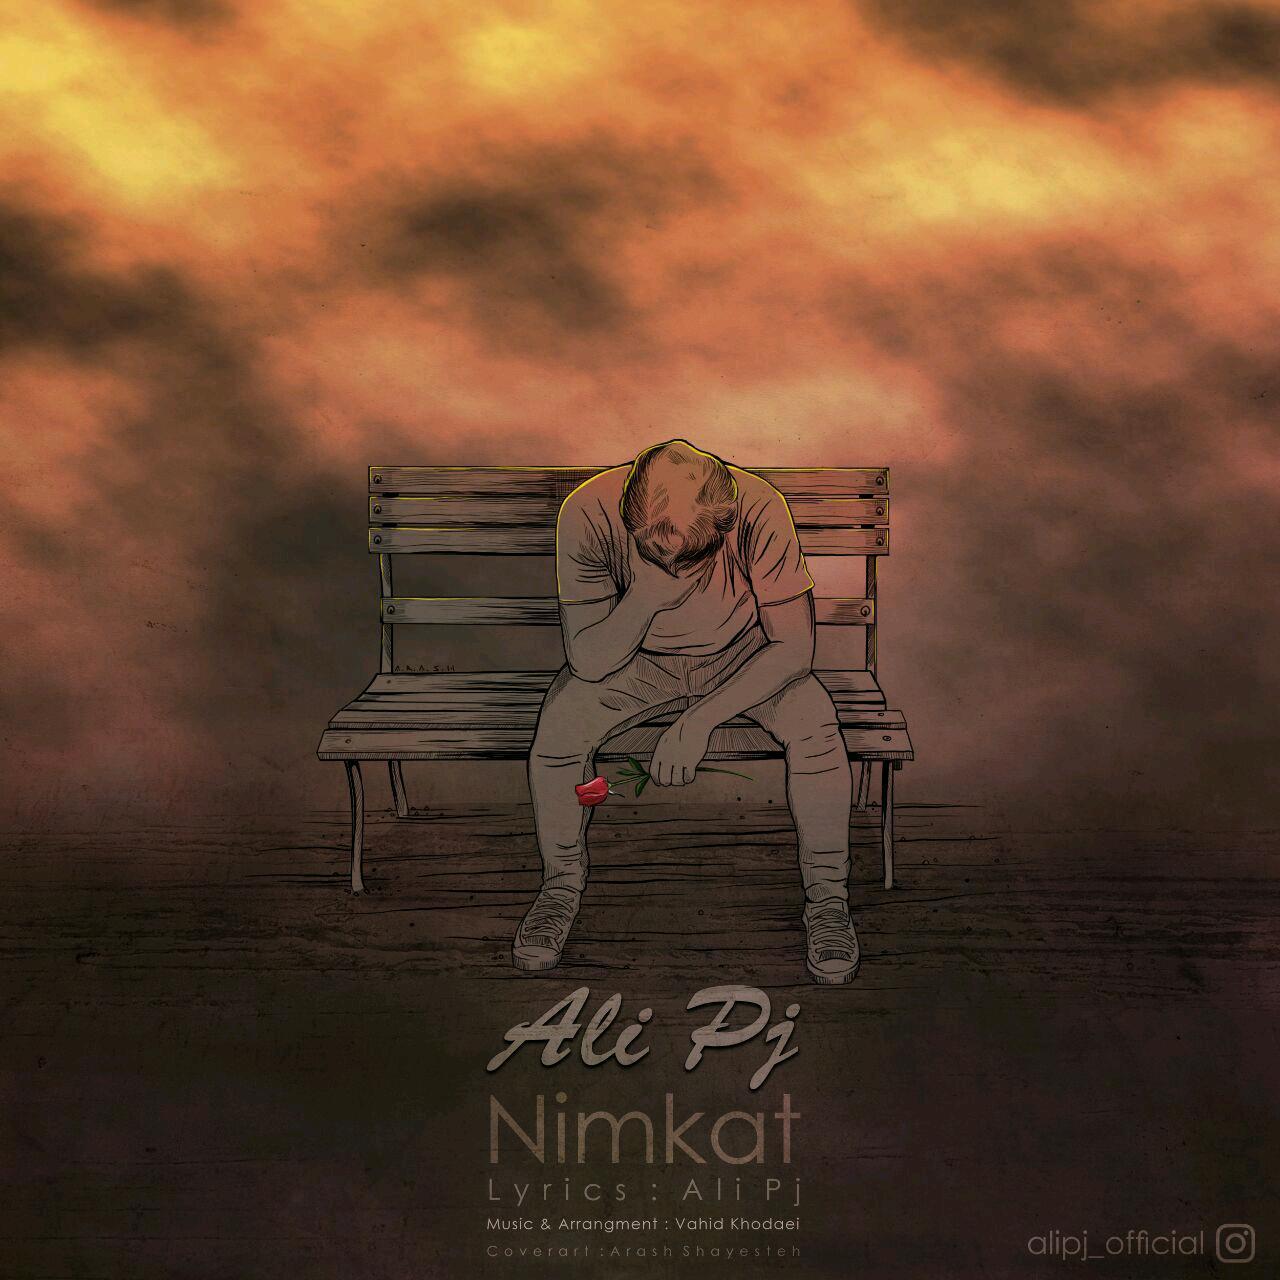 Ali Pj – Nimkat